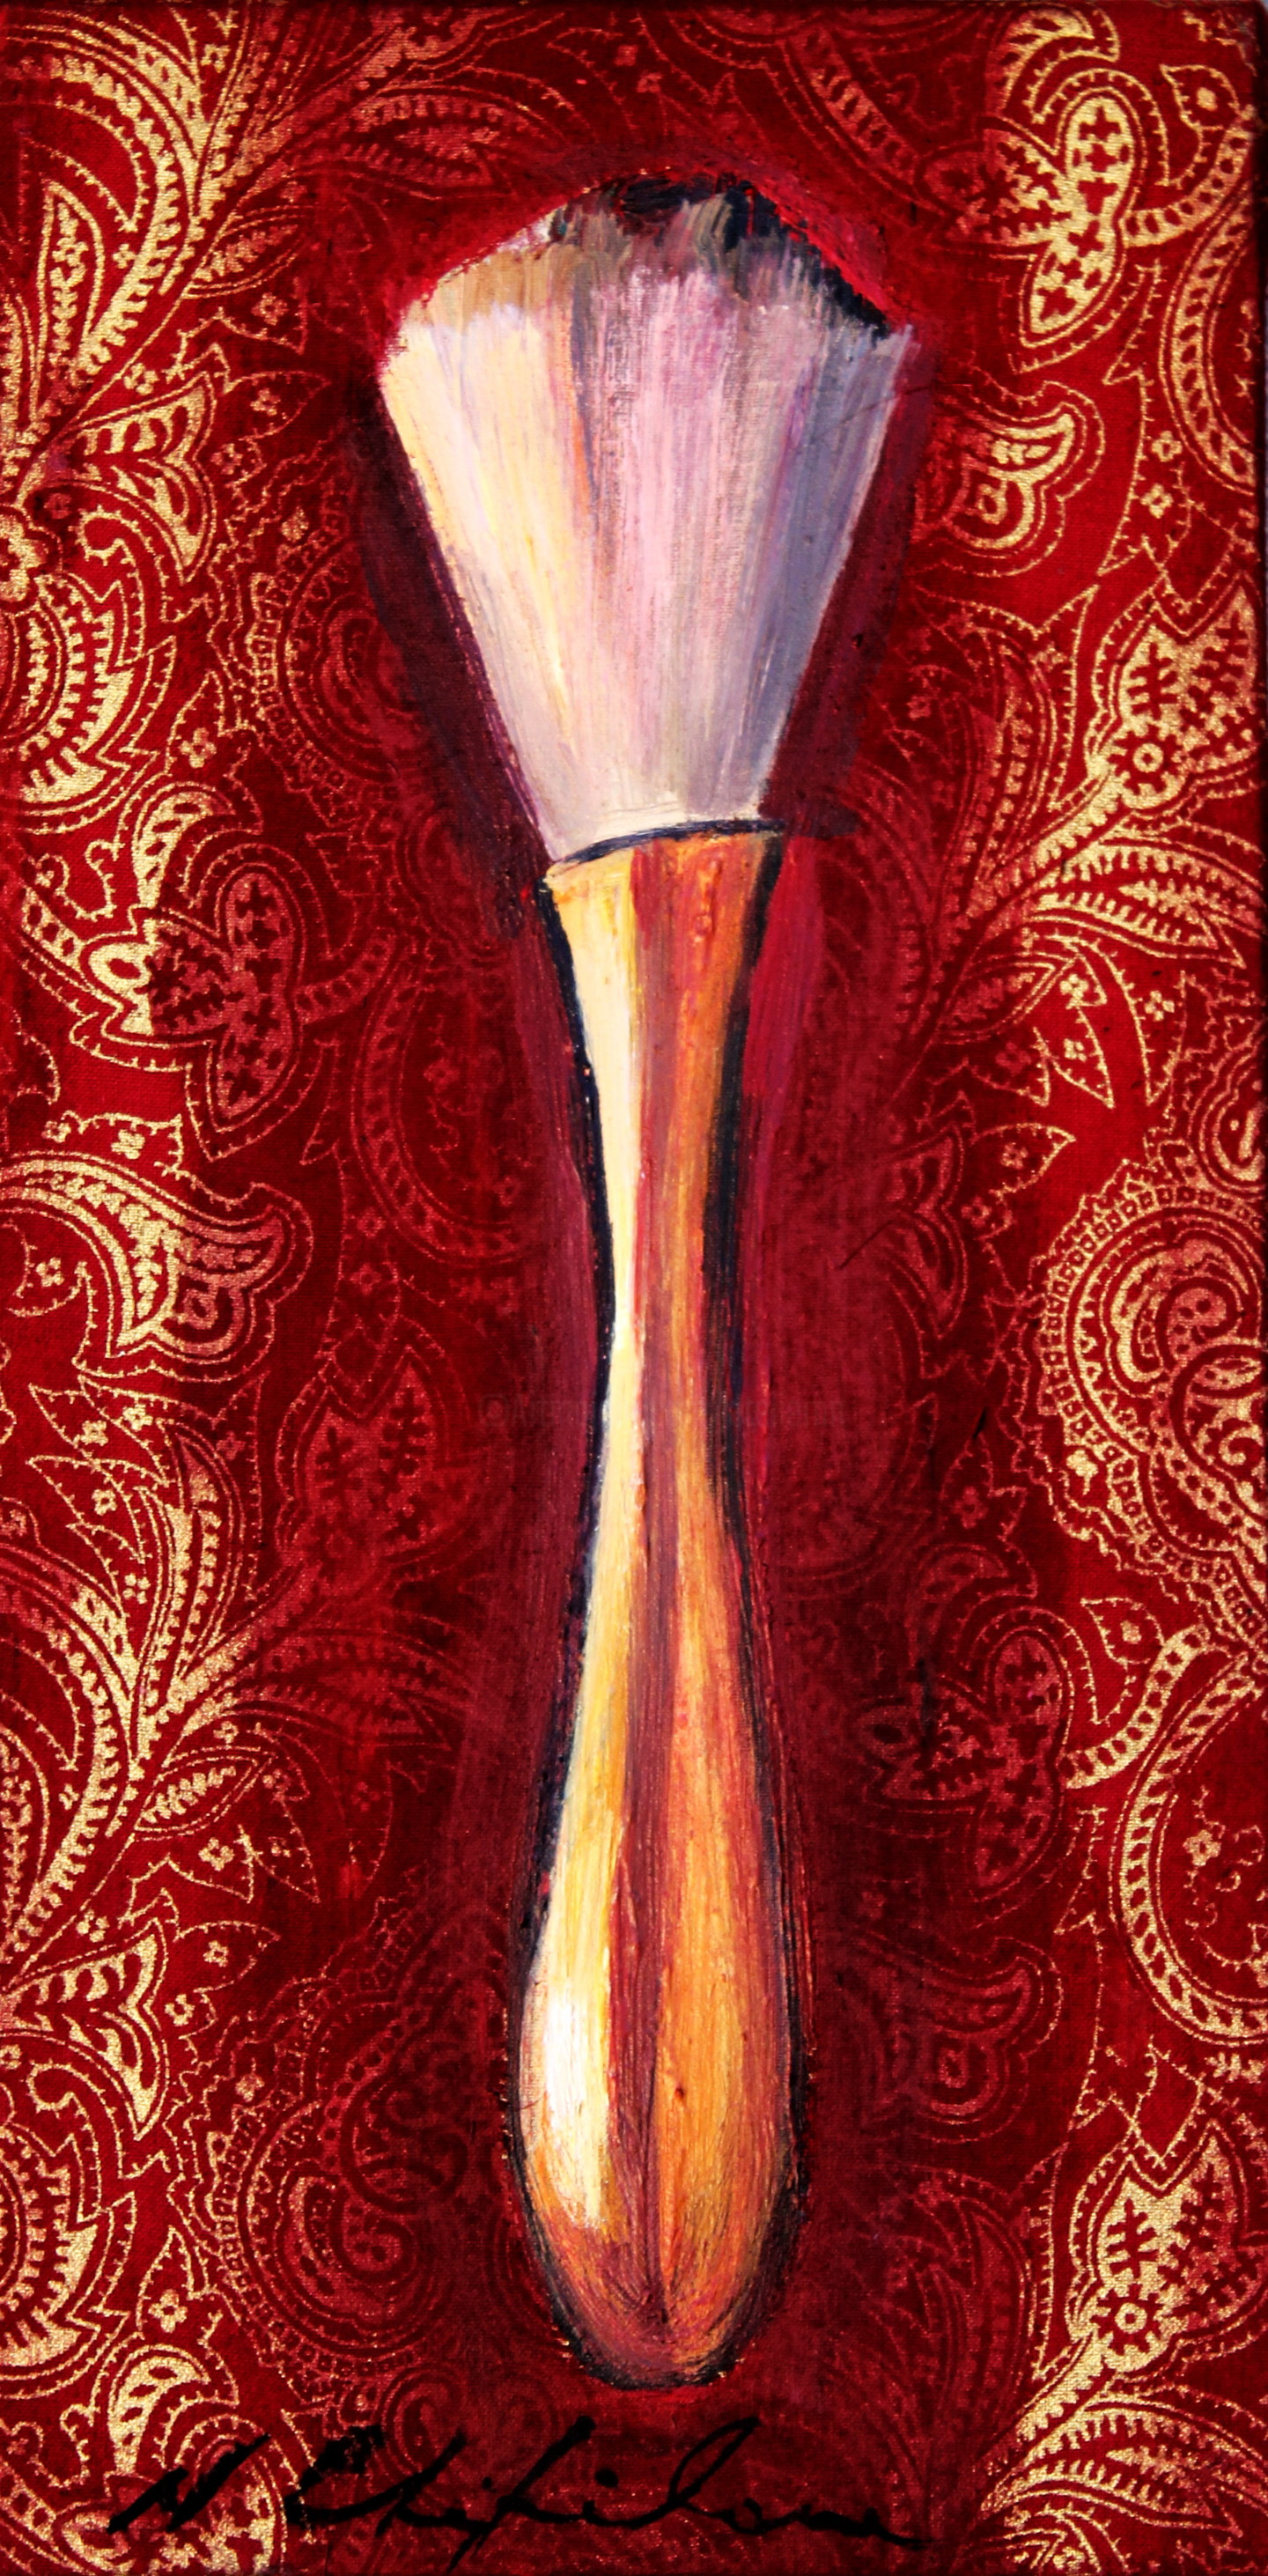 Nath Chipilova (Atelier NN art store) - Brush